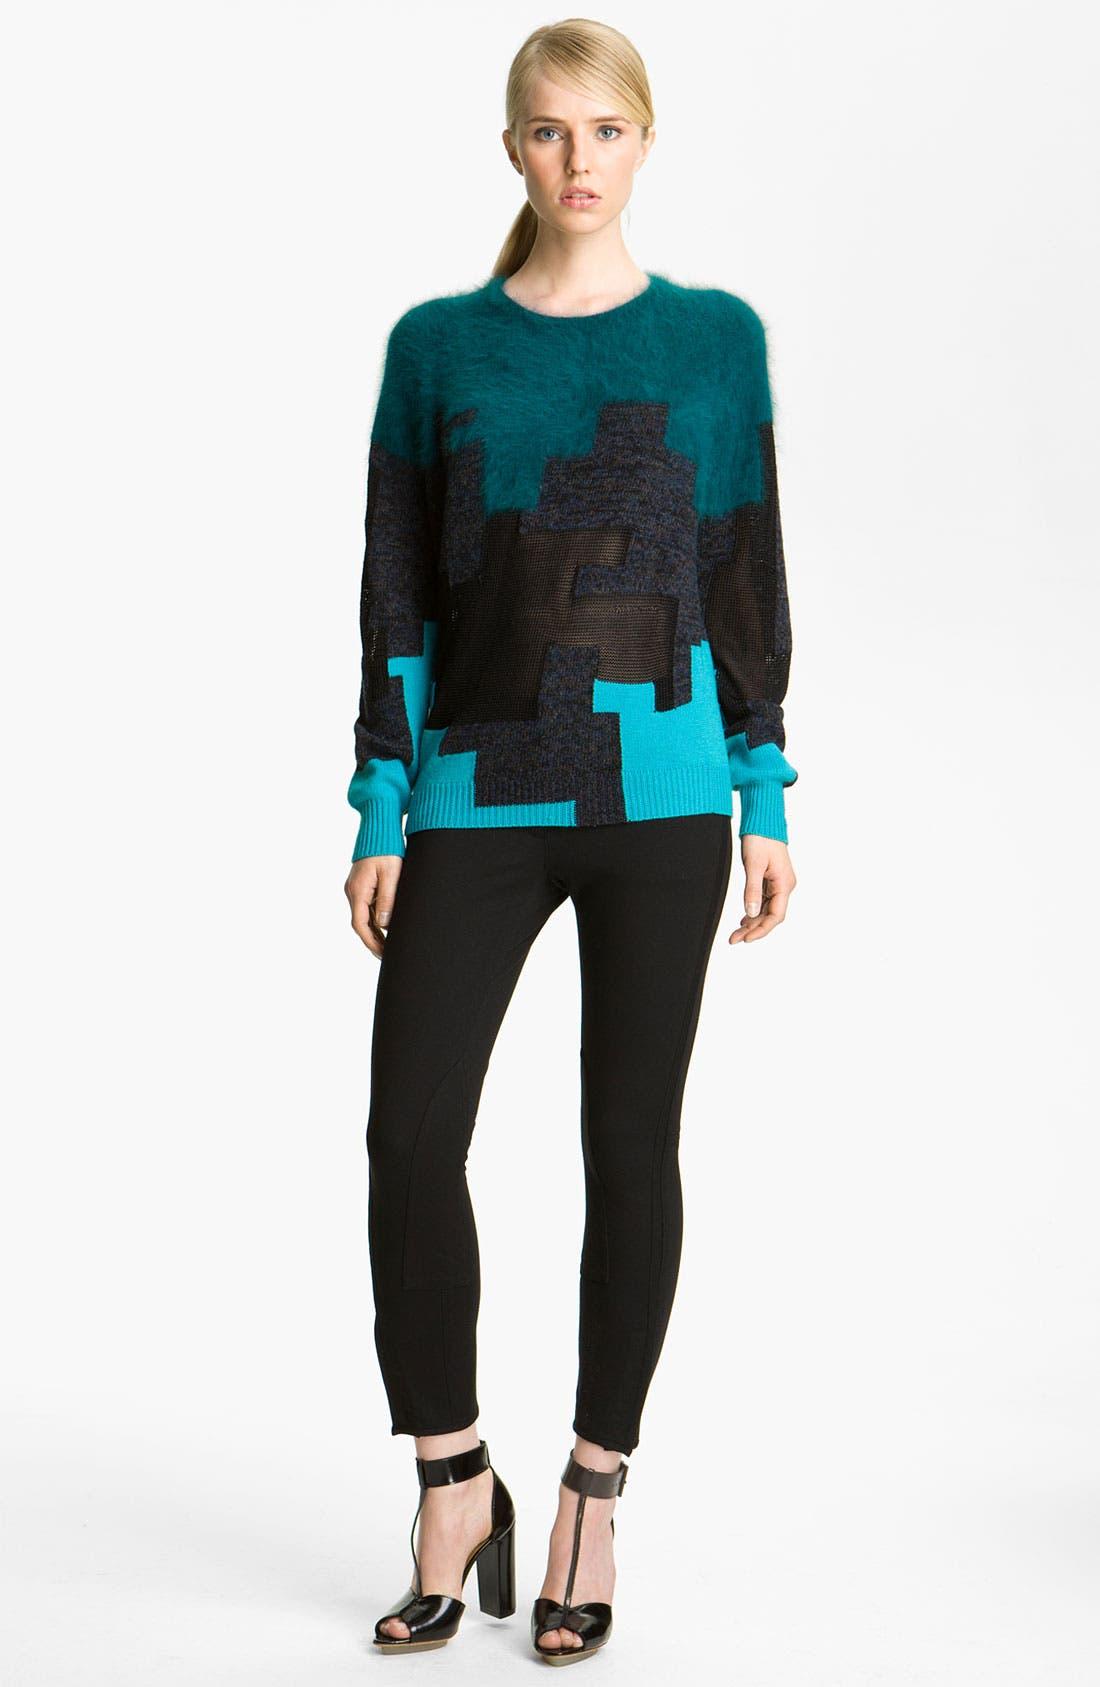 Main Image - 3.1 Phillip Lim Intarsia Sweater